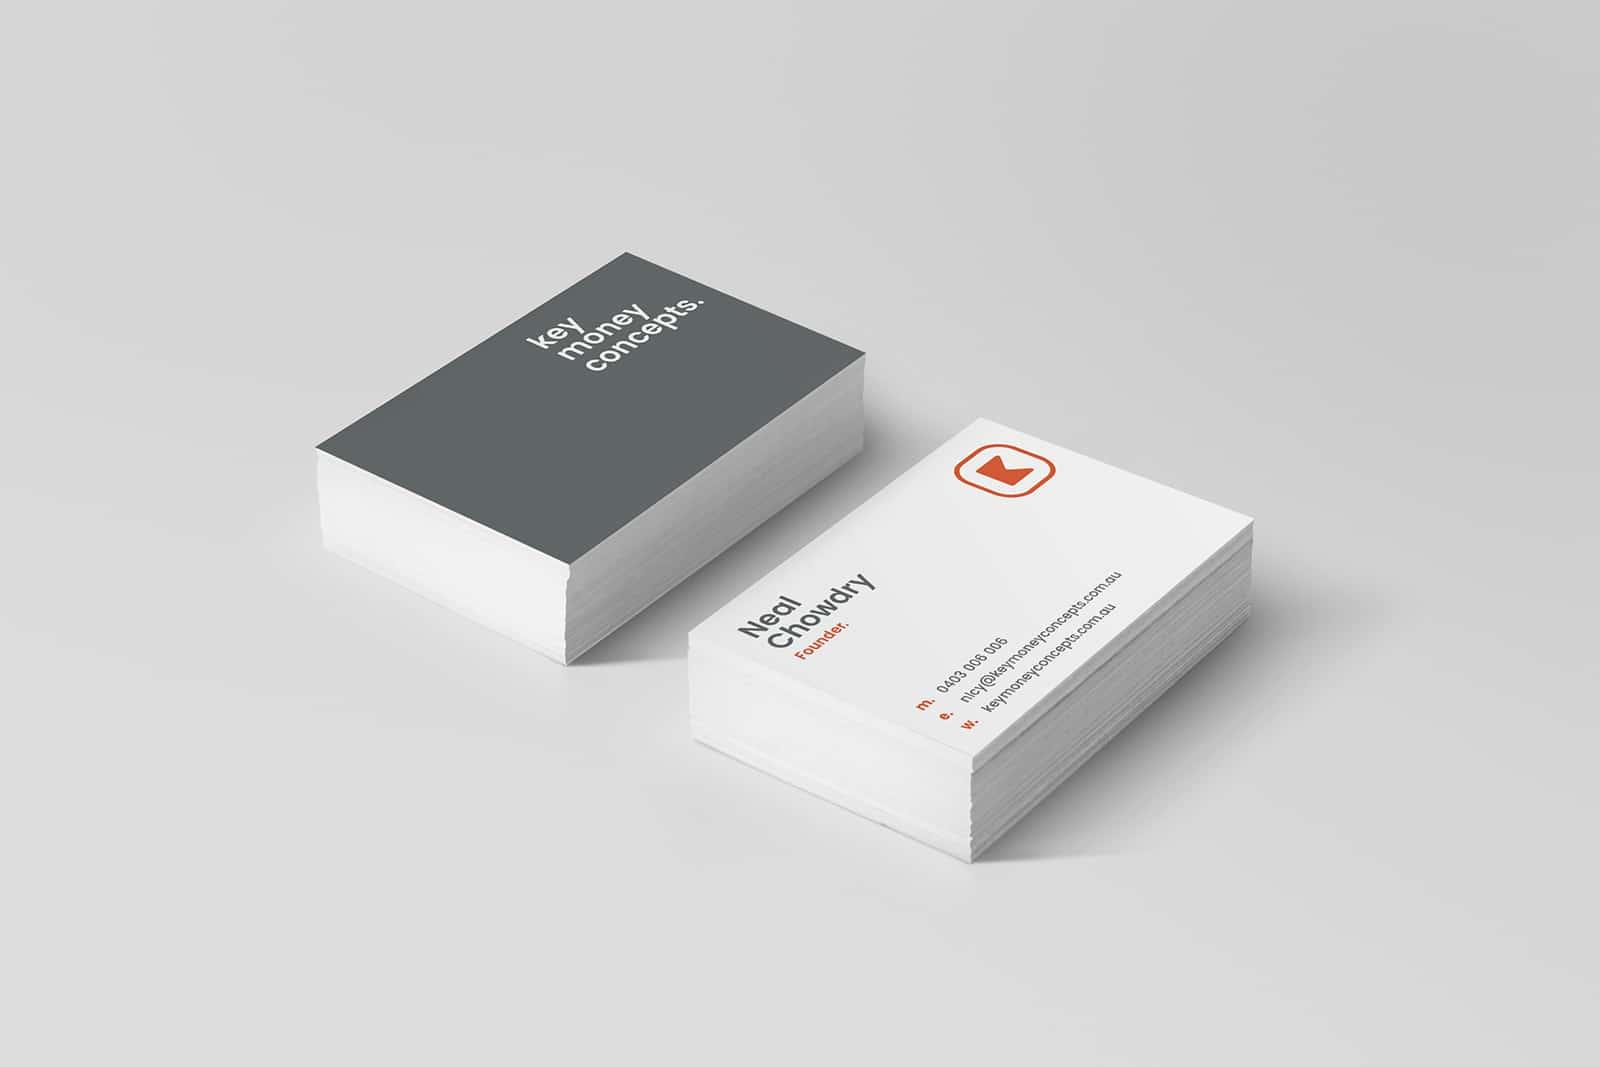 Branding Design Agency Sydney